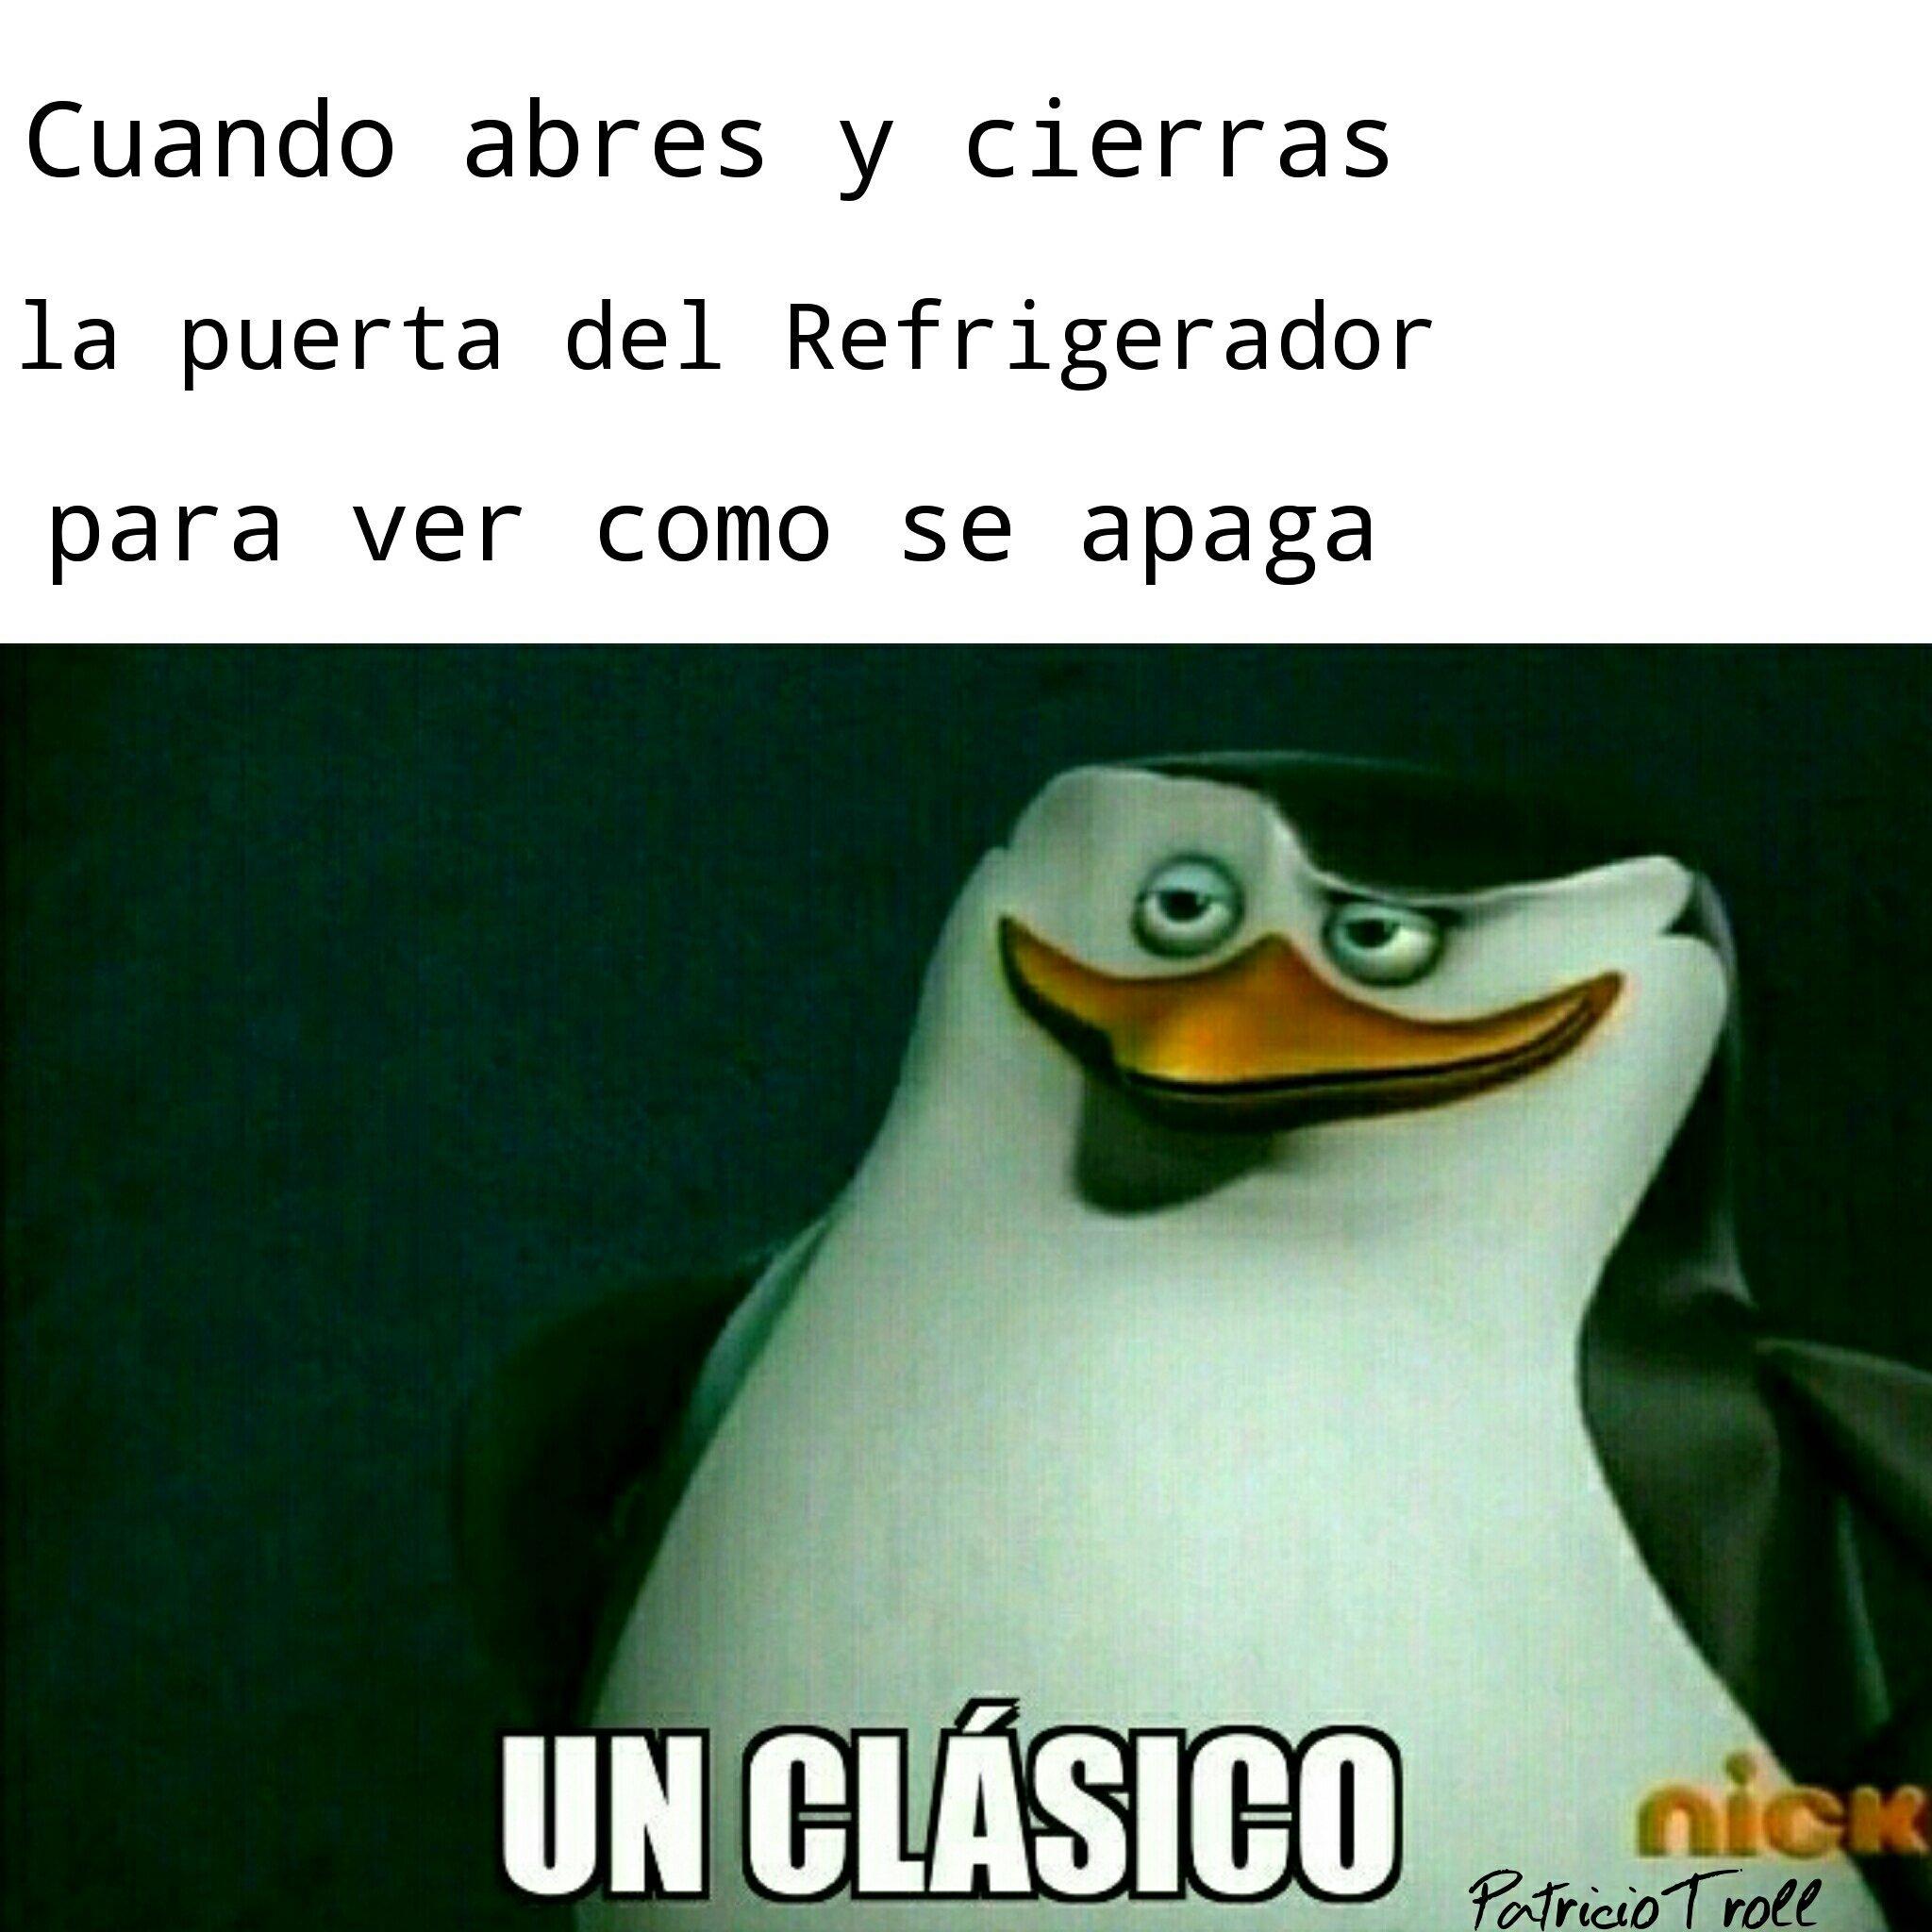 Clásico :'D - meme